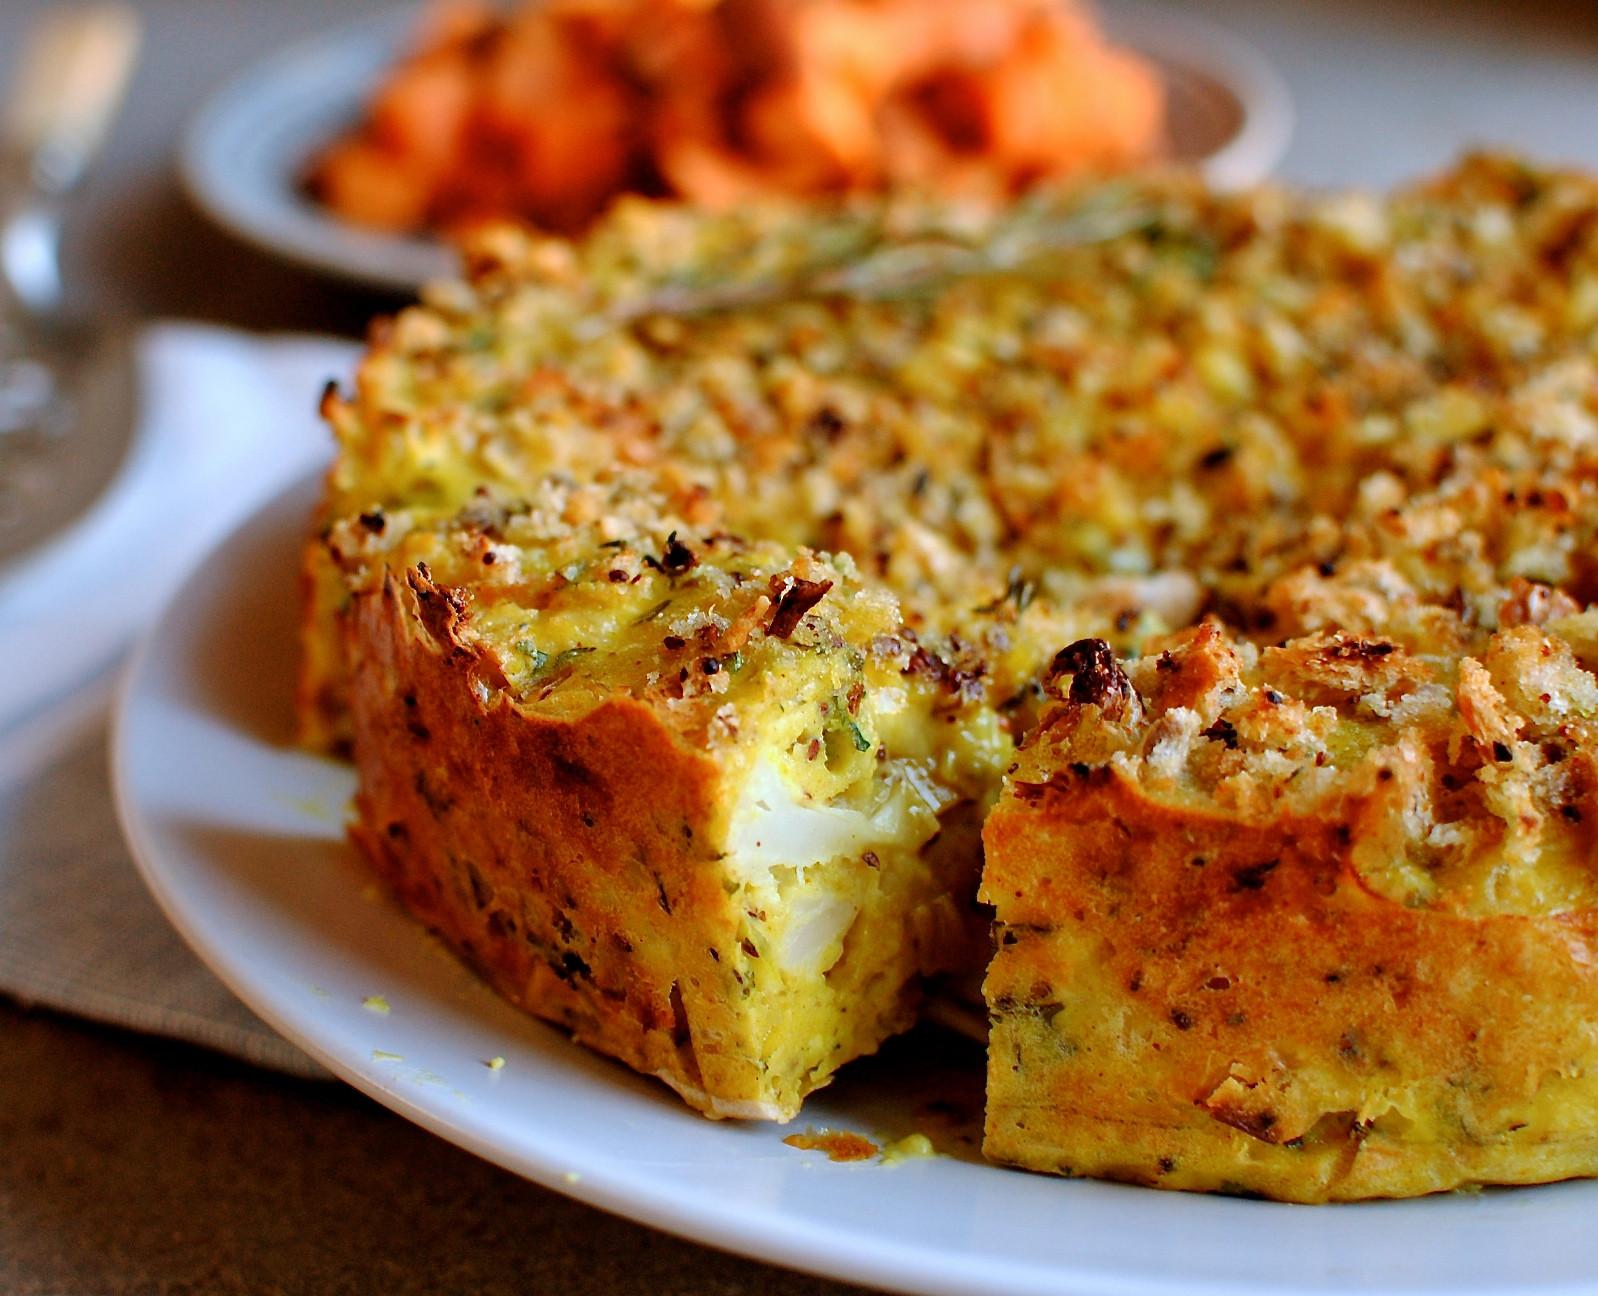 Best Vegetarian Thanksgiving Recipes  11 Last Minute Ve arian Thanksgiving Day Recipes